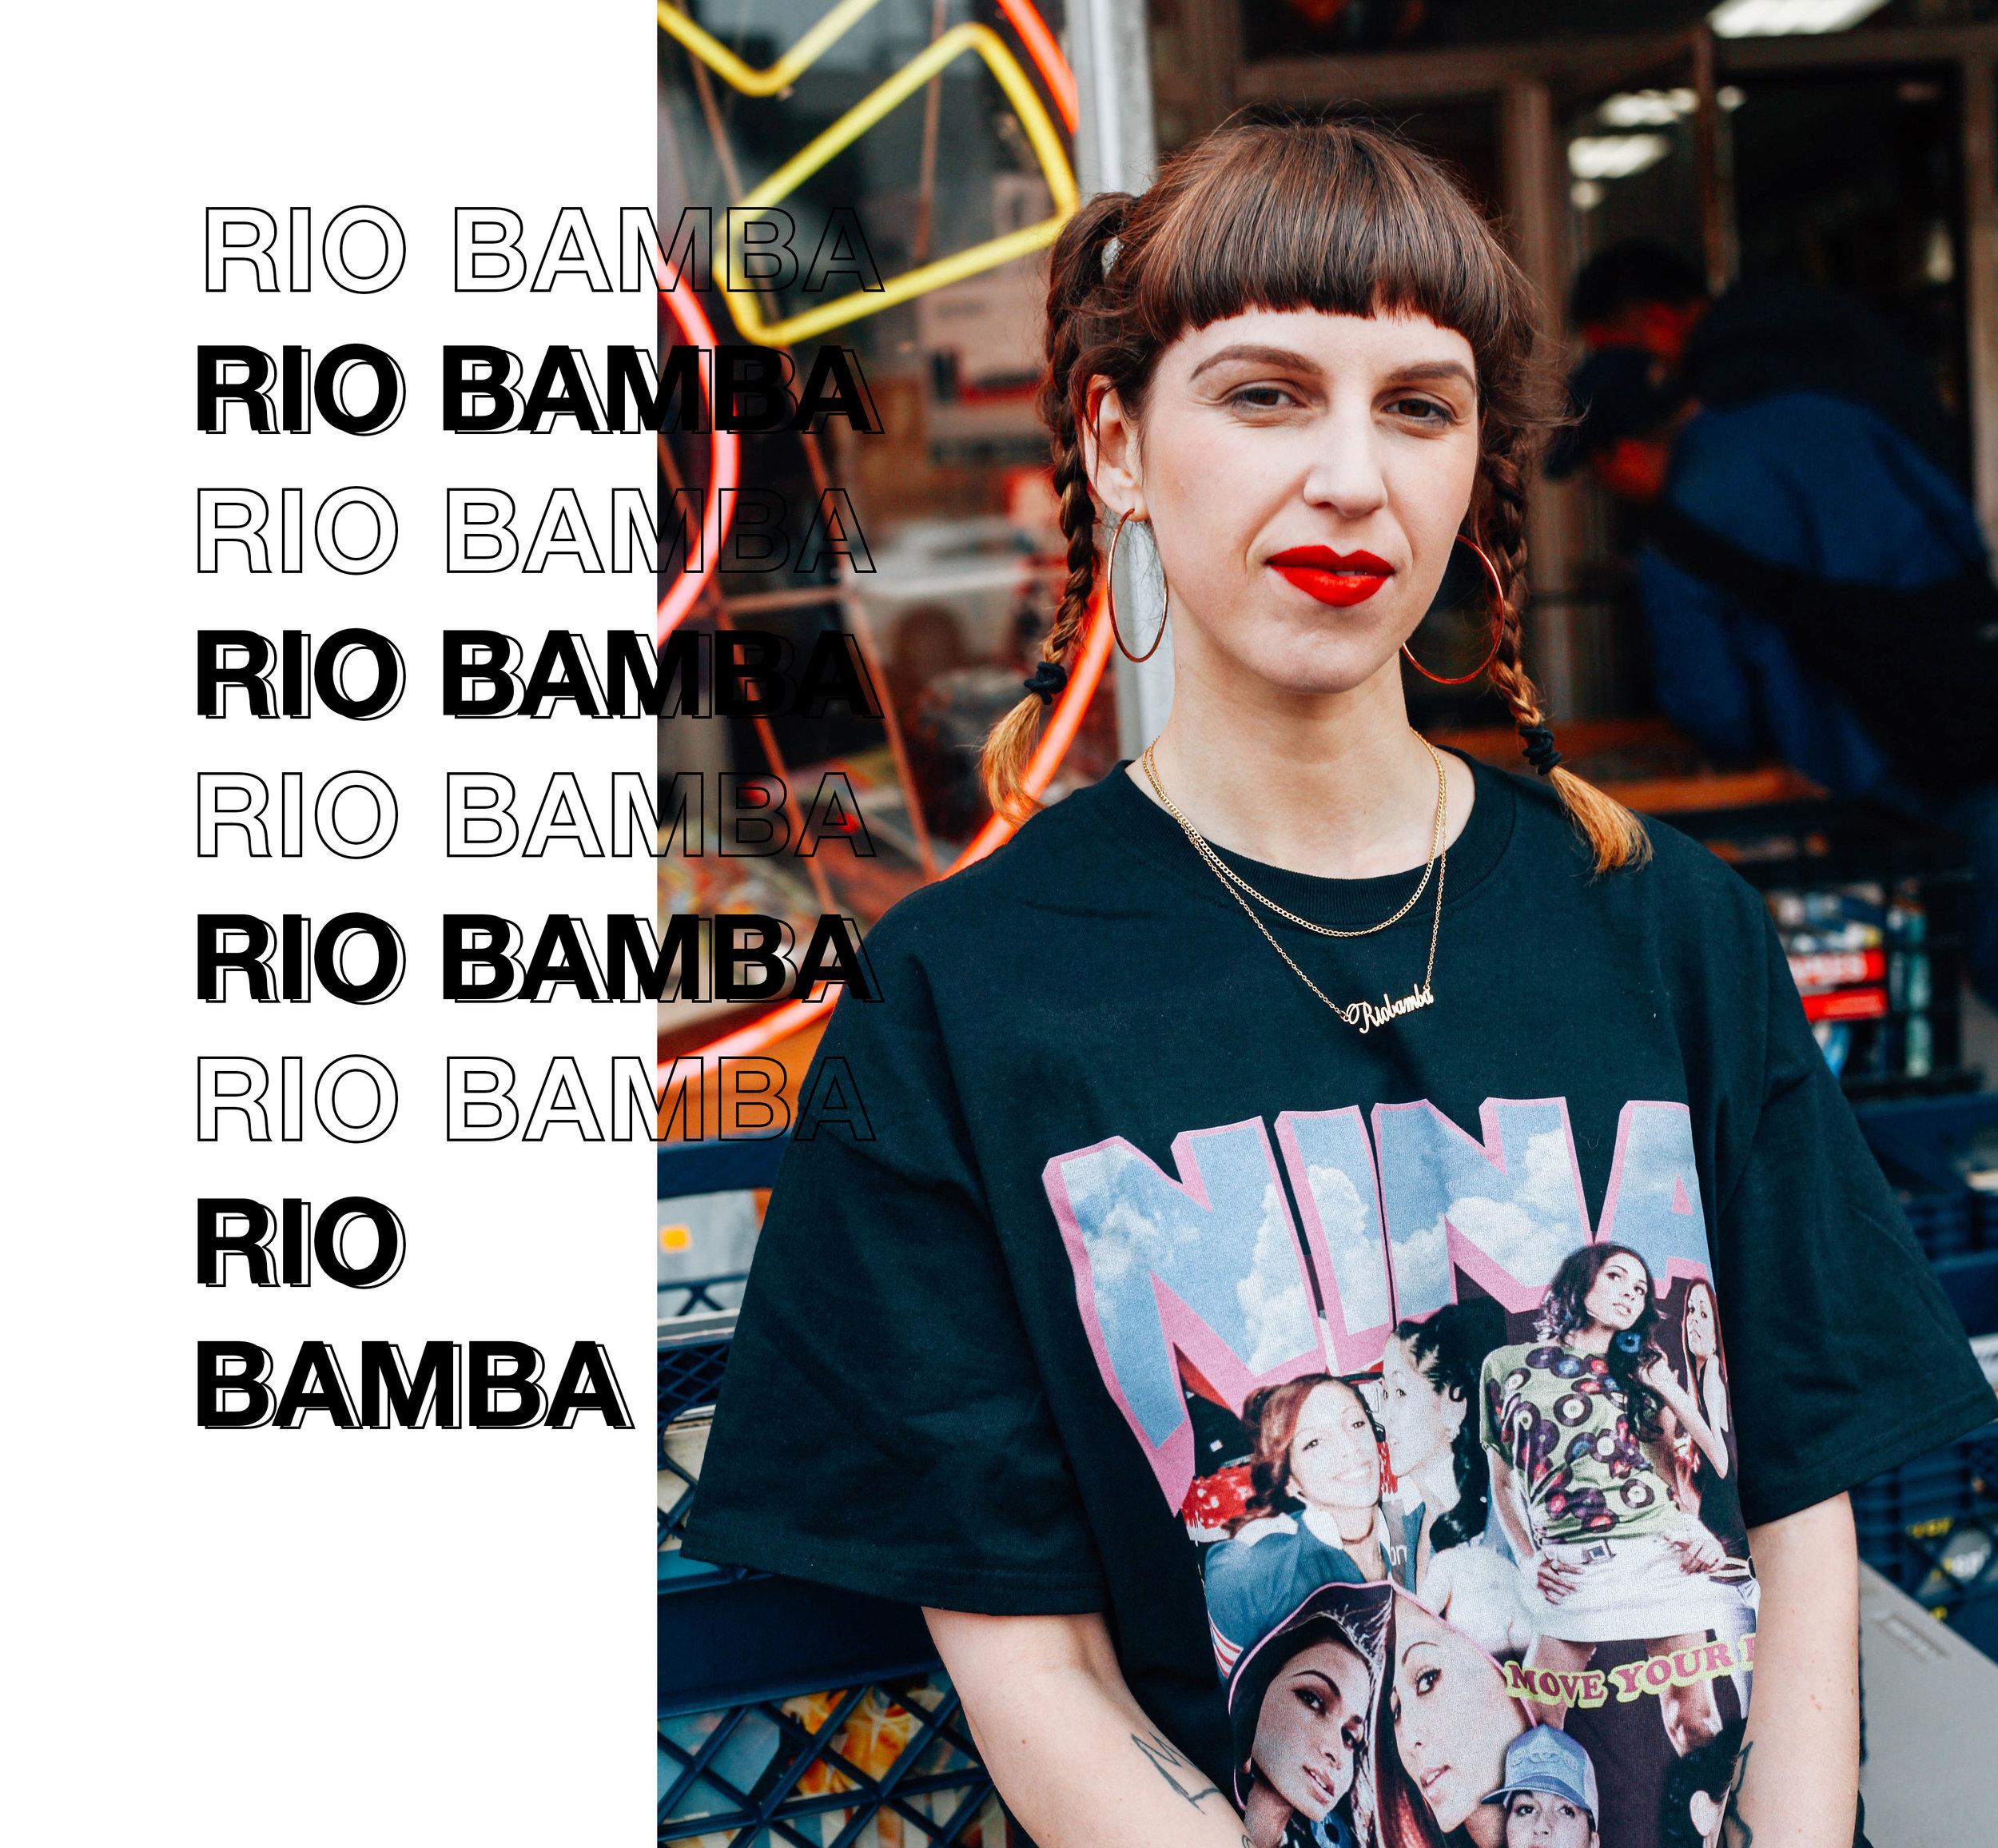 Rio-Bamba-Square-Artist-Card.jpg